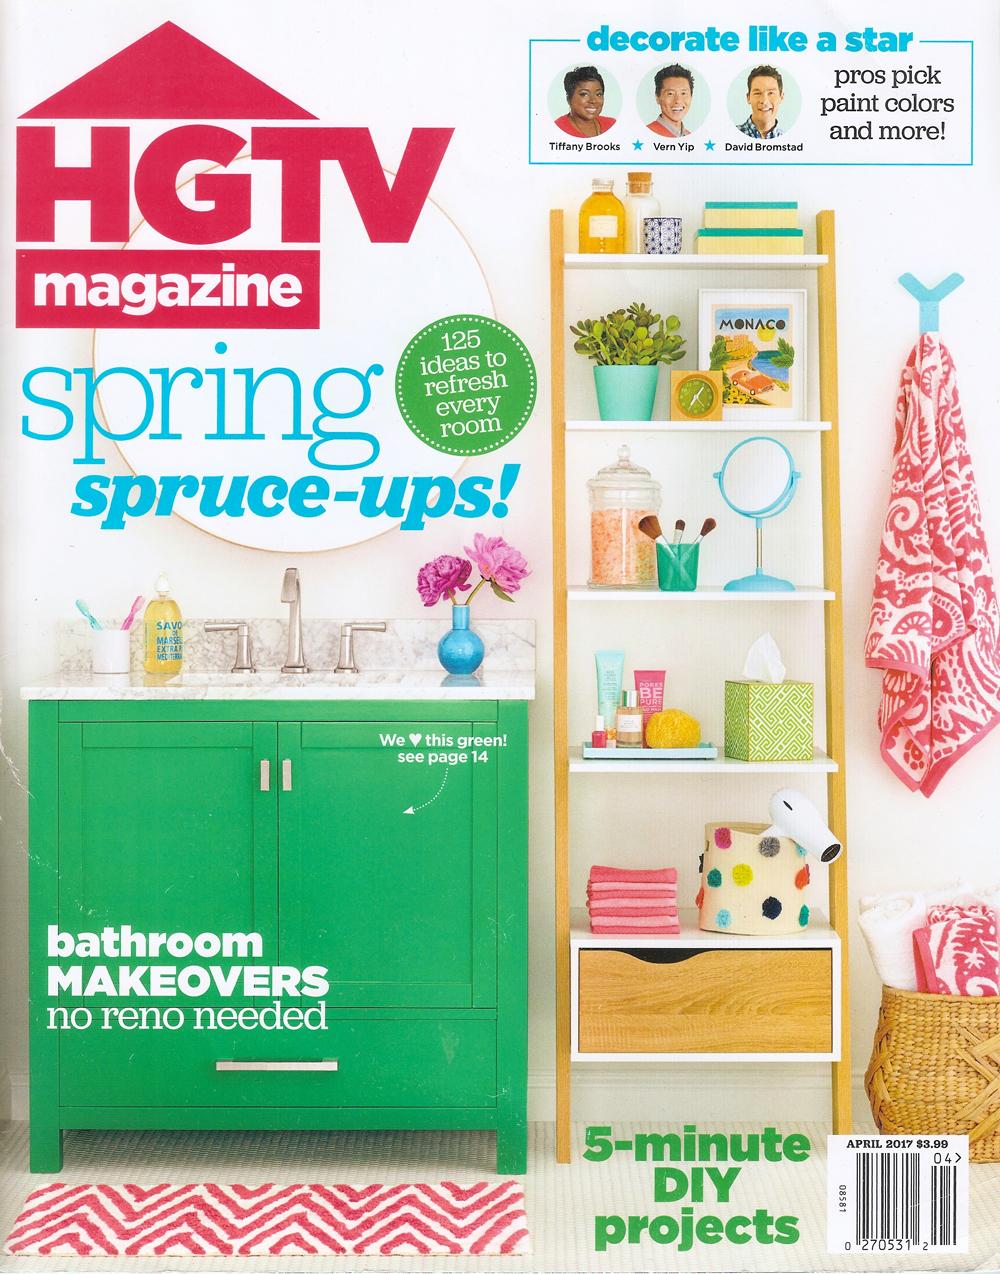 HGTV MAGAZINE - April 2017